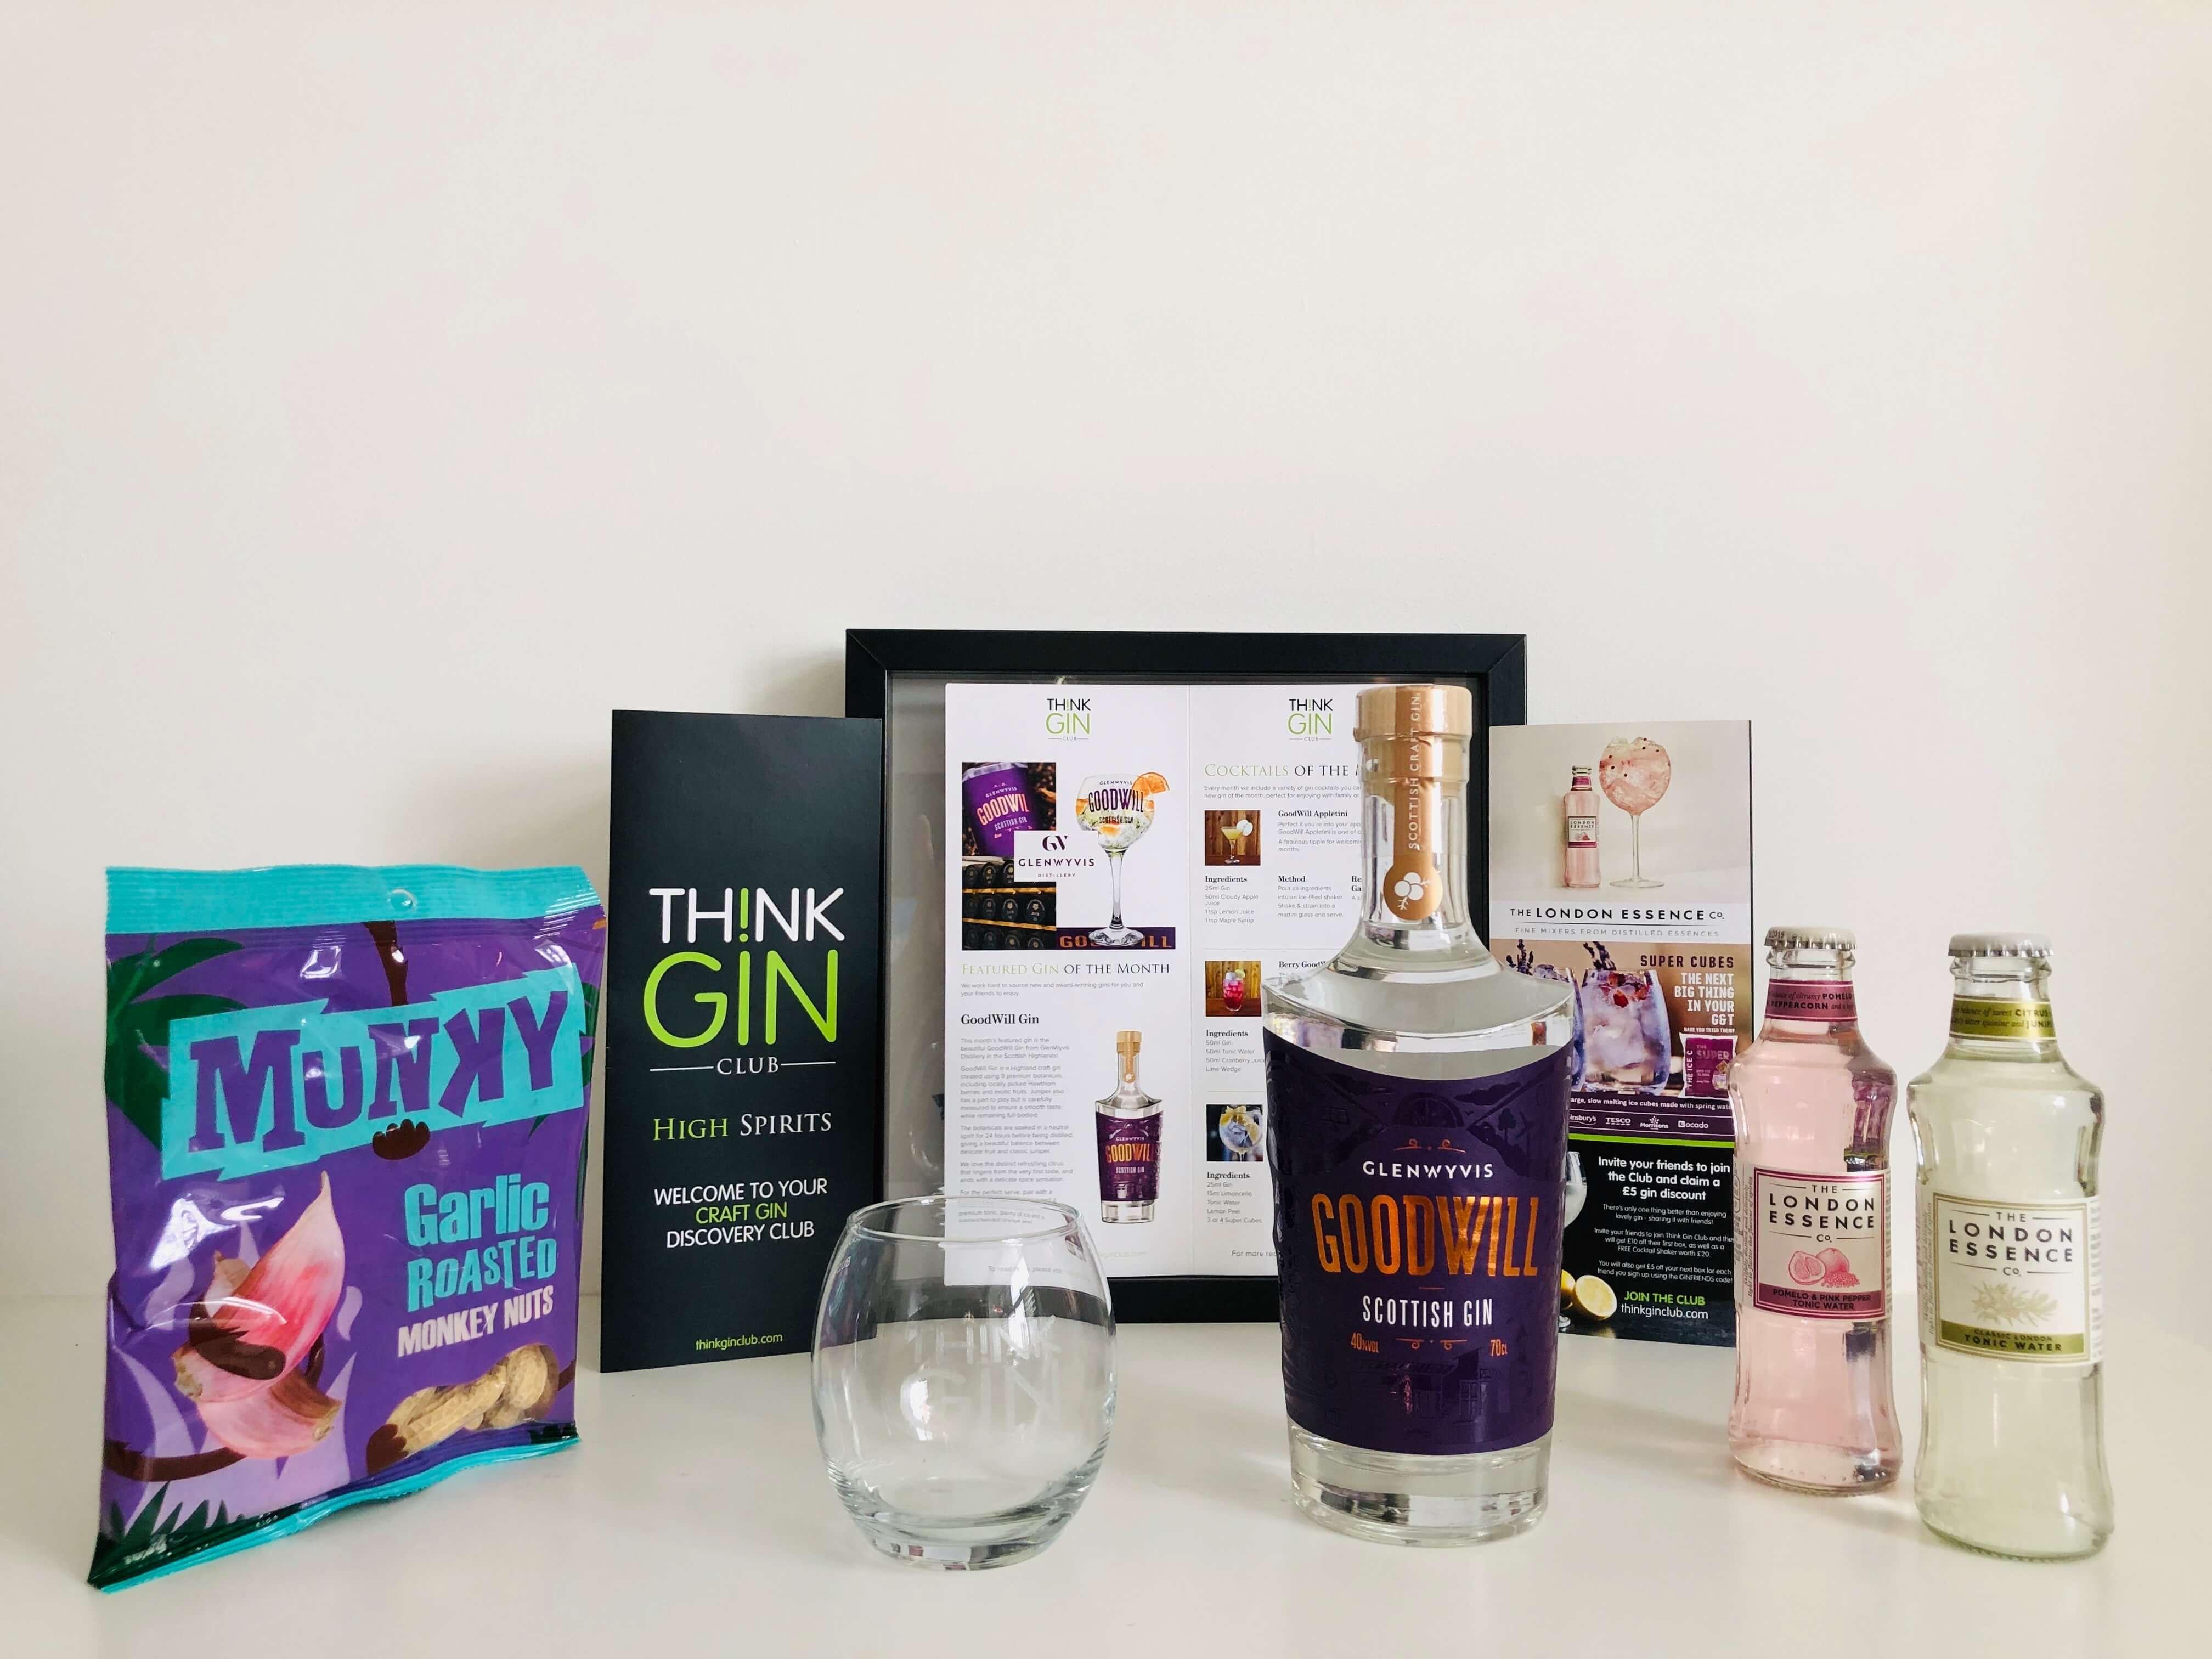 Goodwill Gin, Artisan Gin Club, Monthly Gin